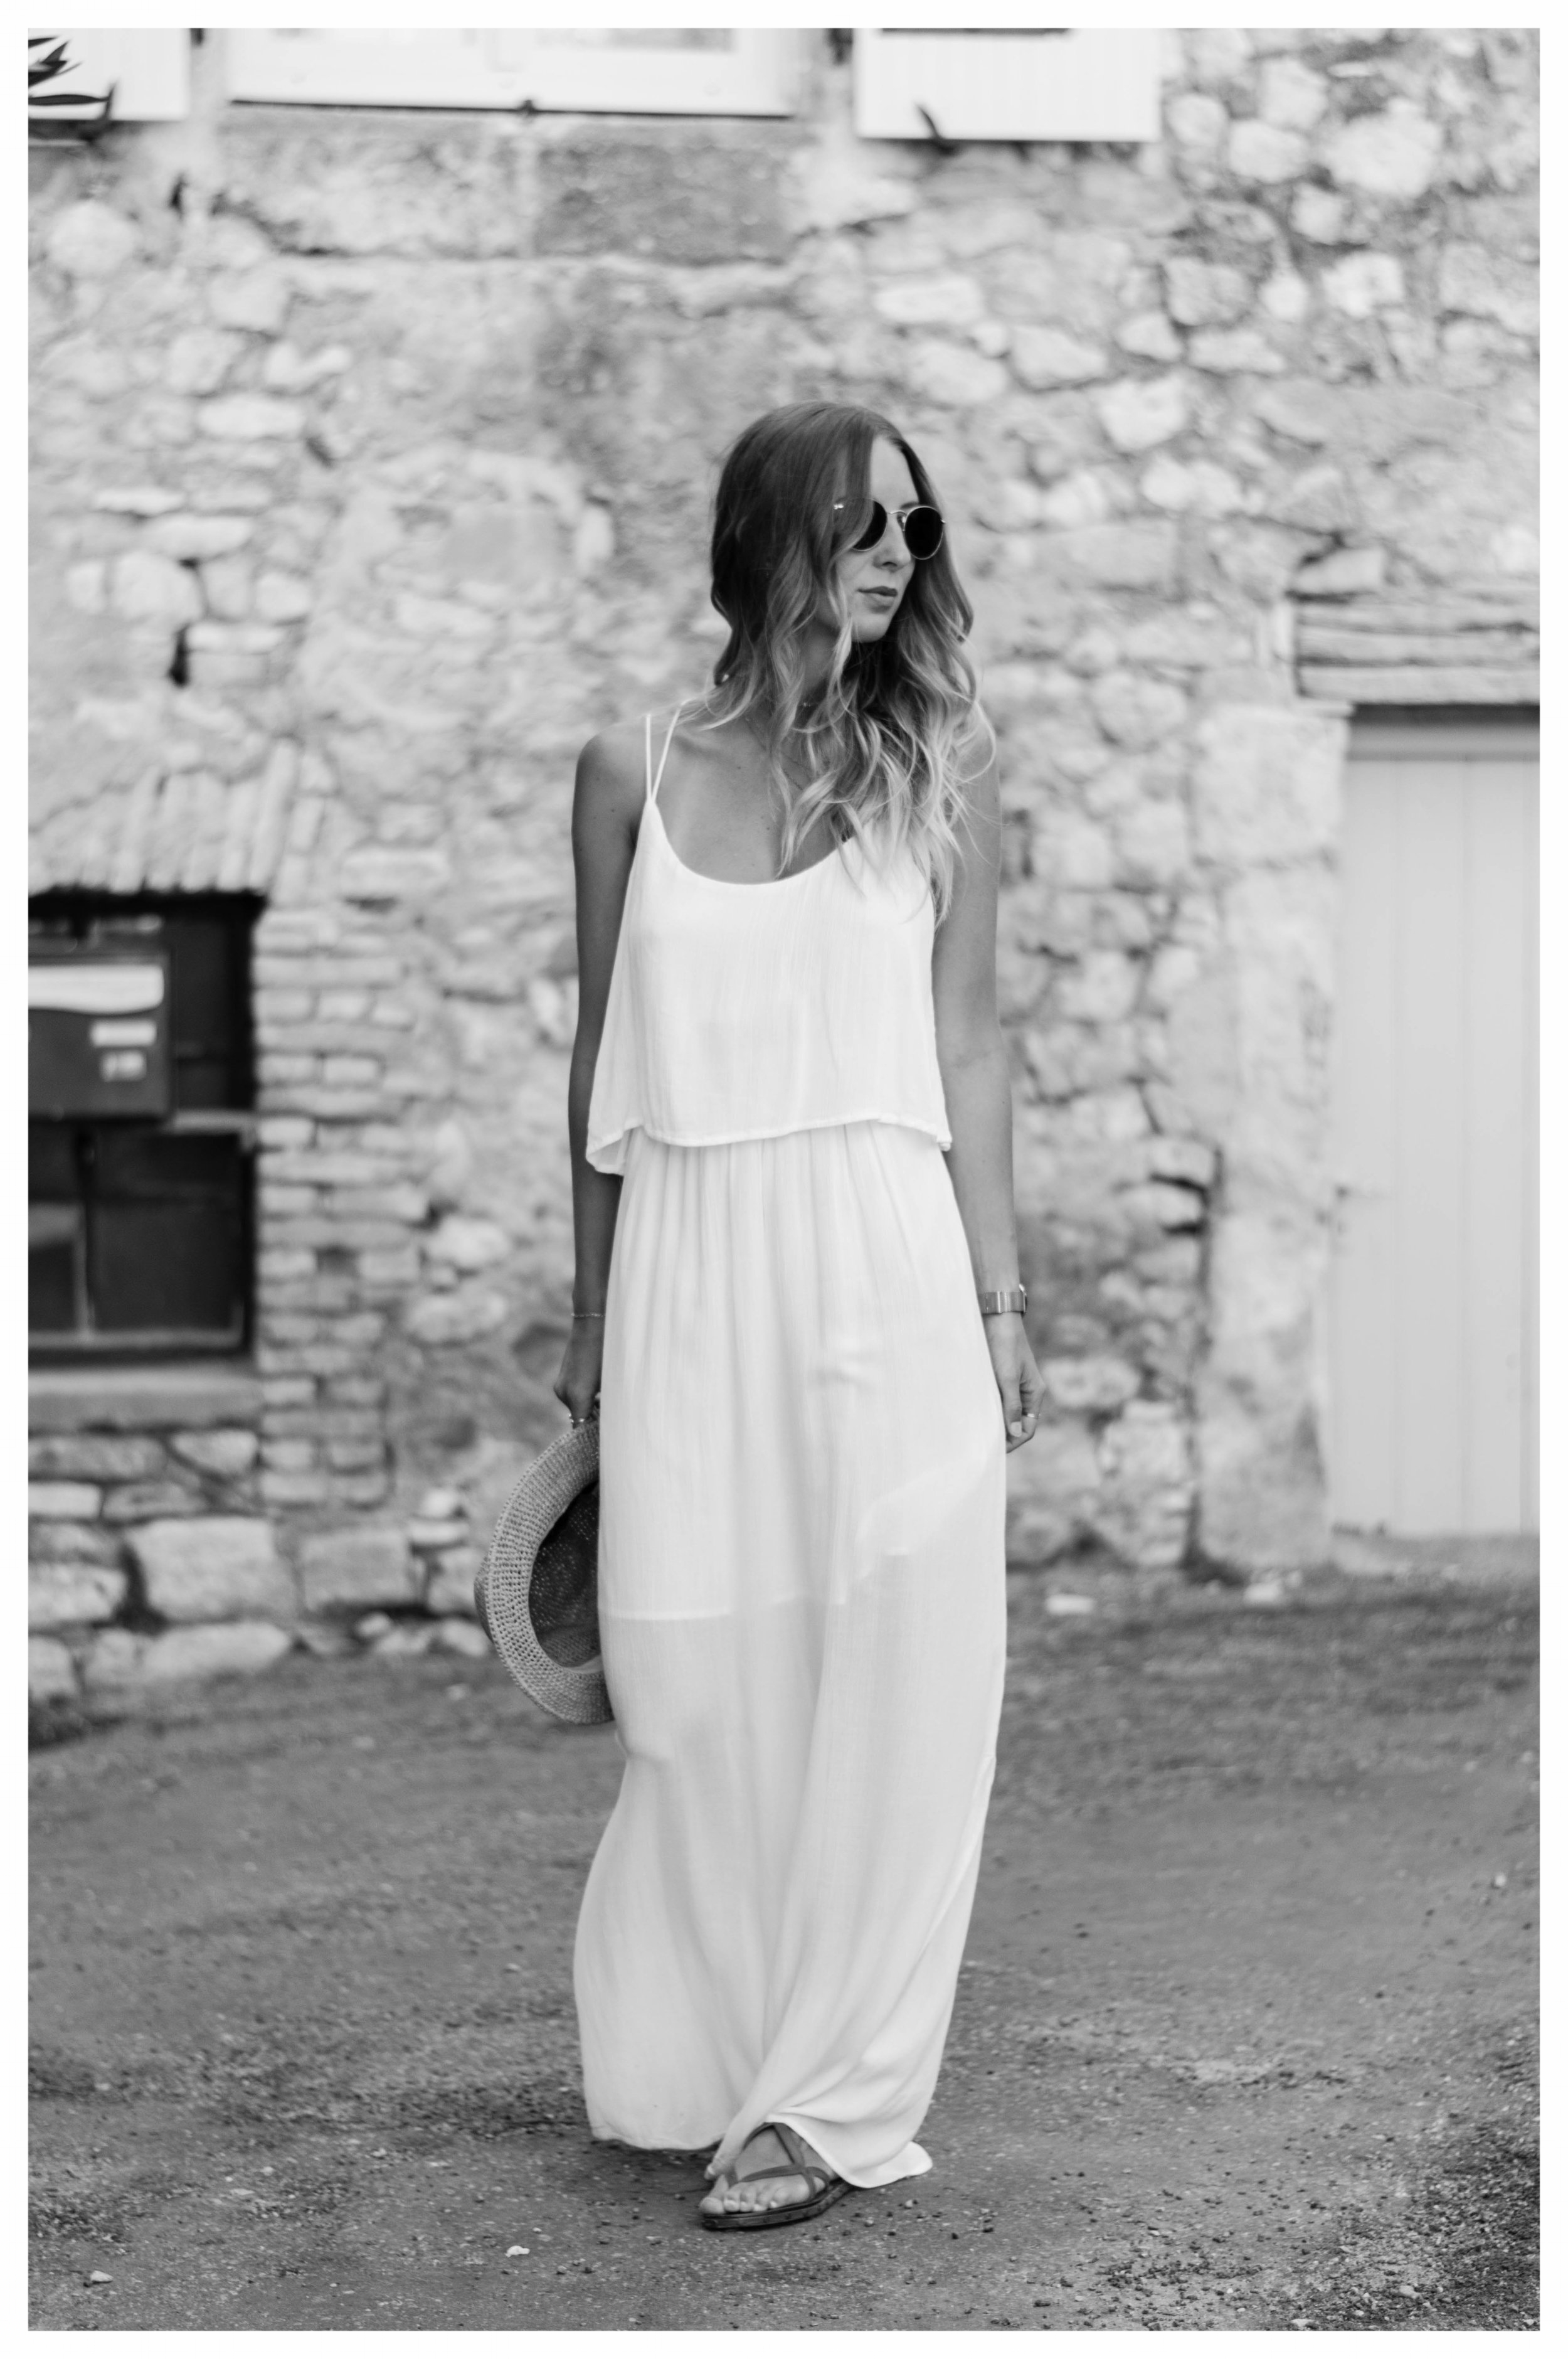 White Dress - OSIARAH.COM (2 sur 16).jpg